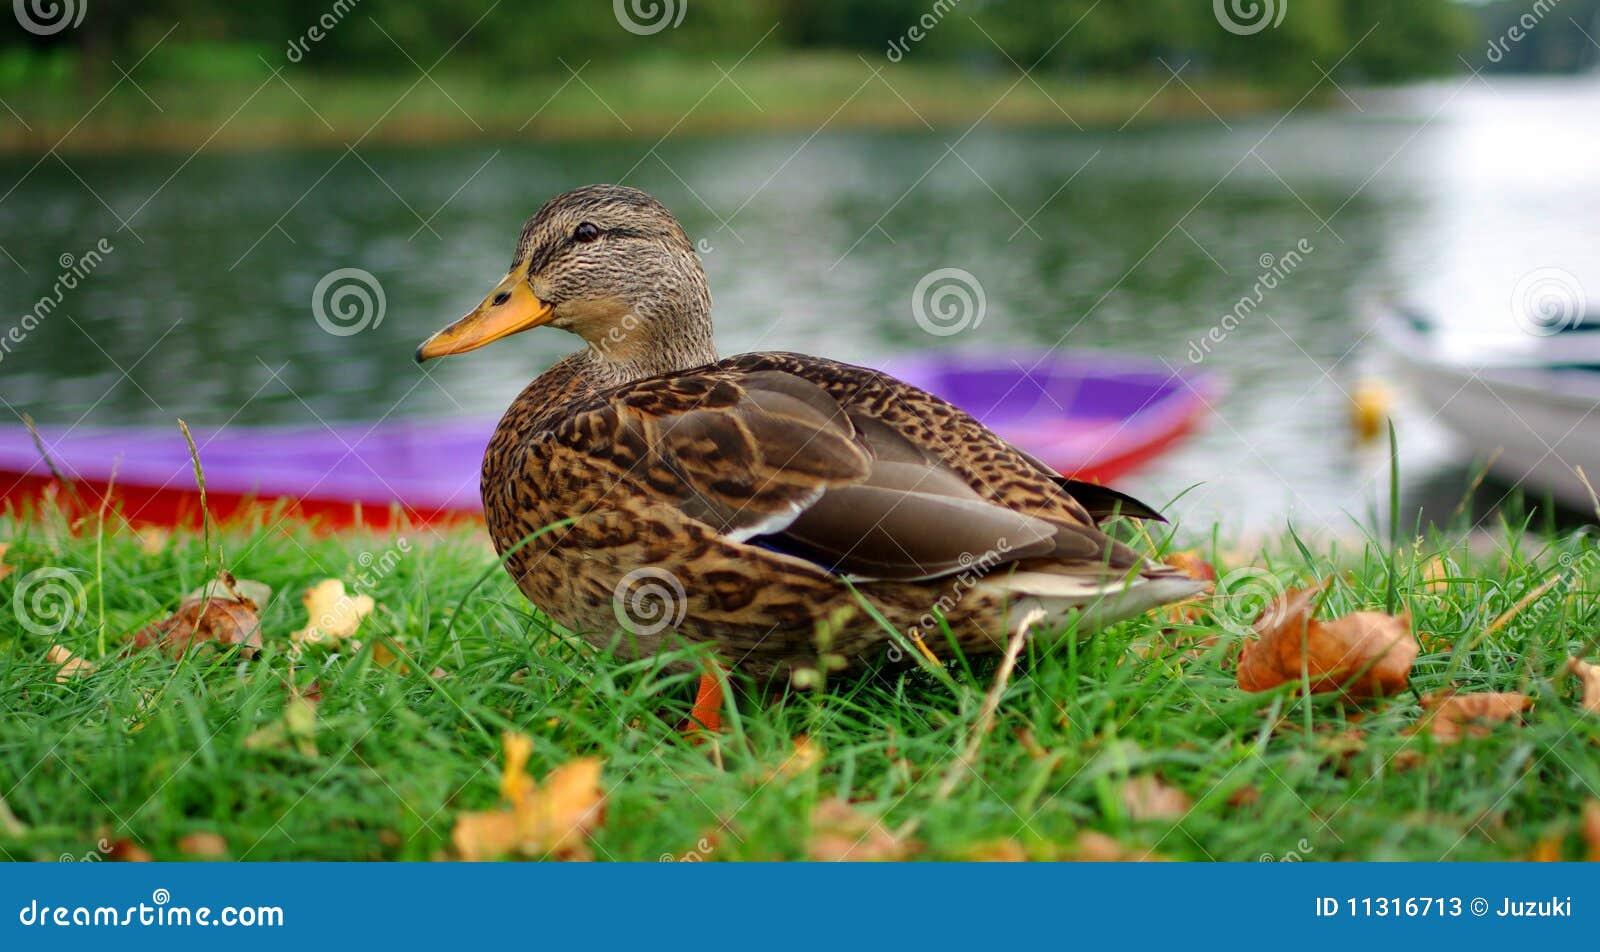 Ente auf Gras